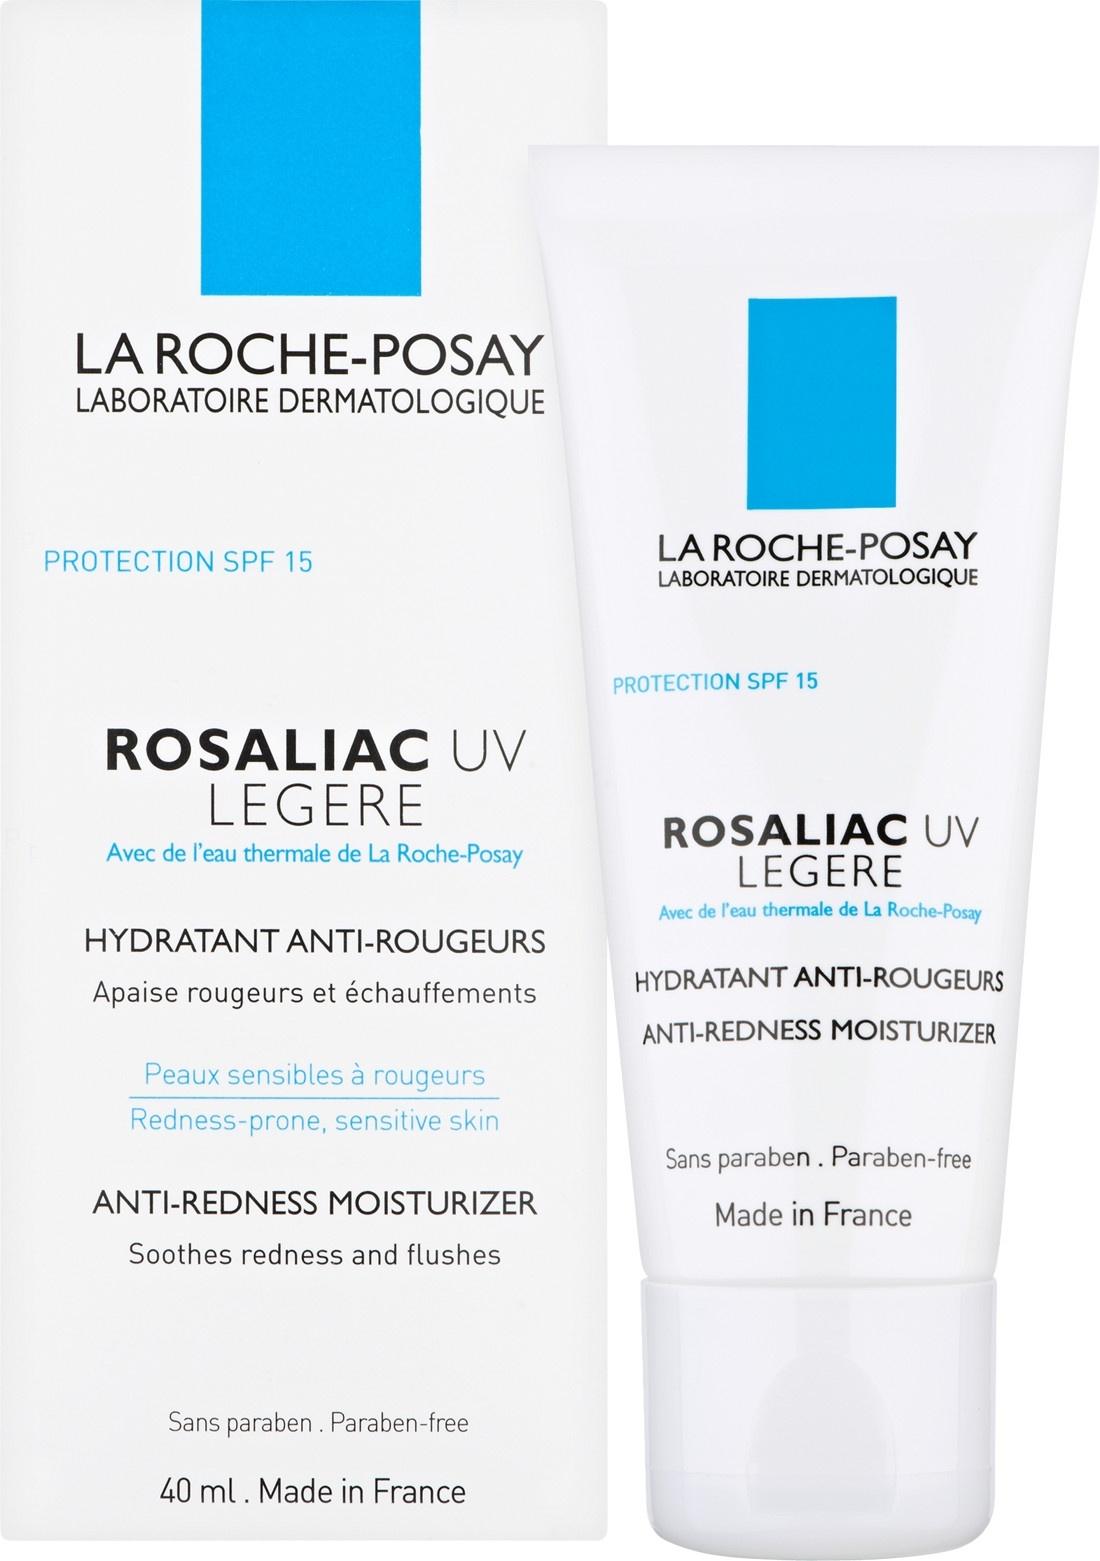 La Roche-Posay Rosaliac UV Legere Fortifying Anti-Redness Moisturiser SPF15, 40ml